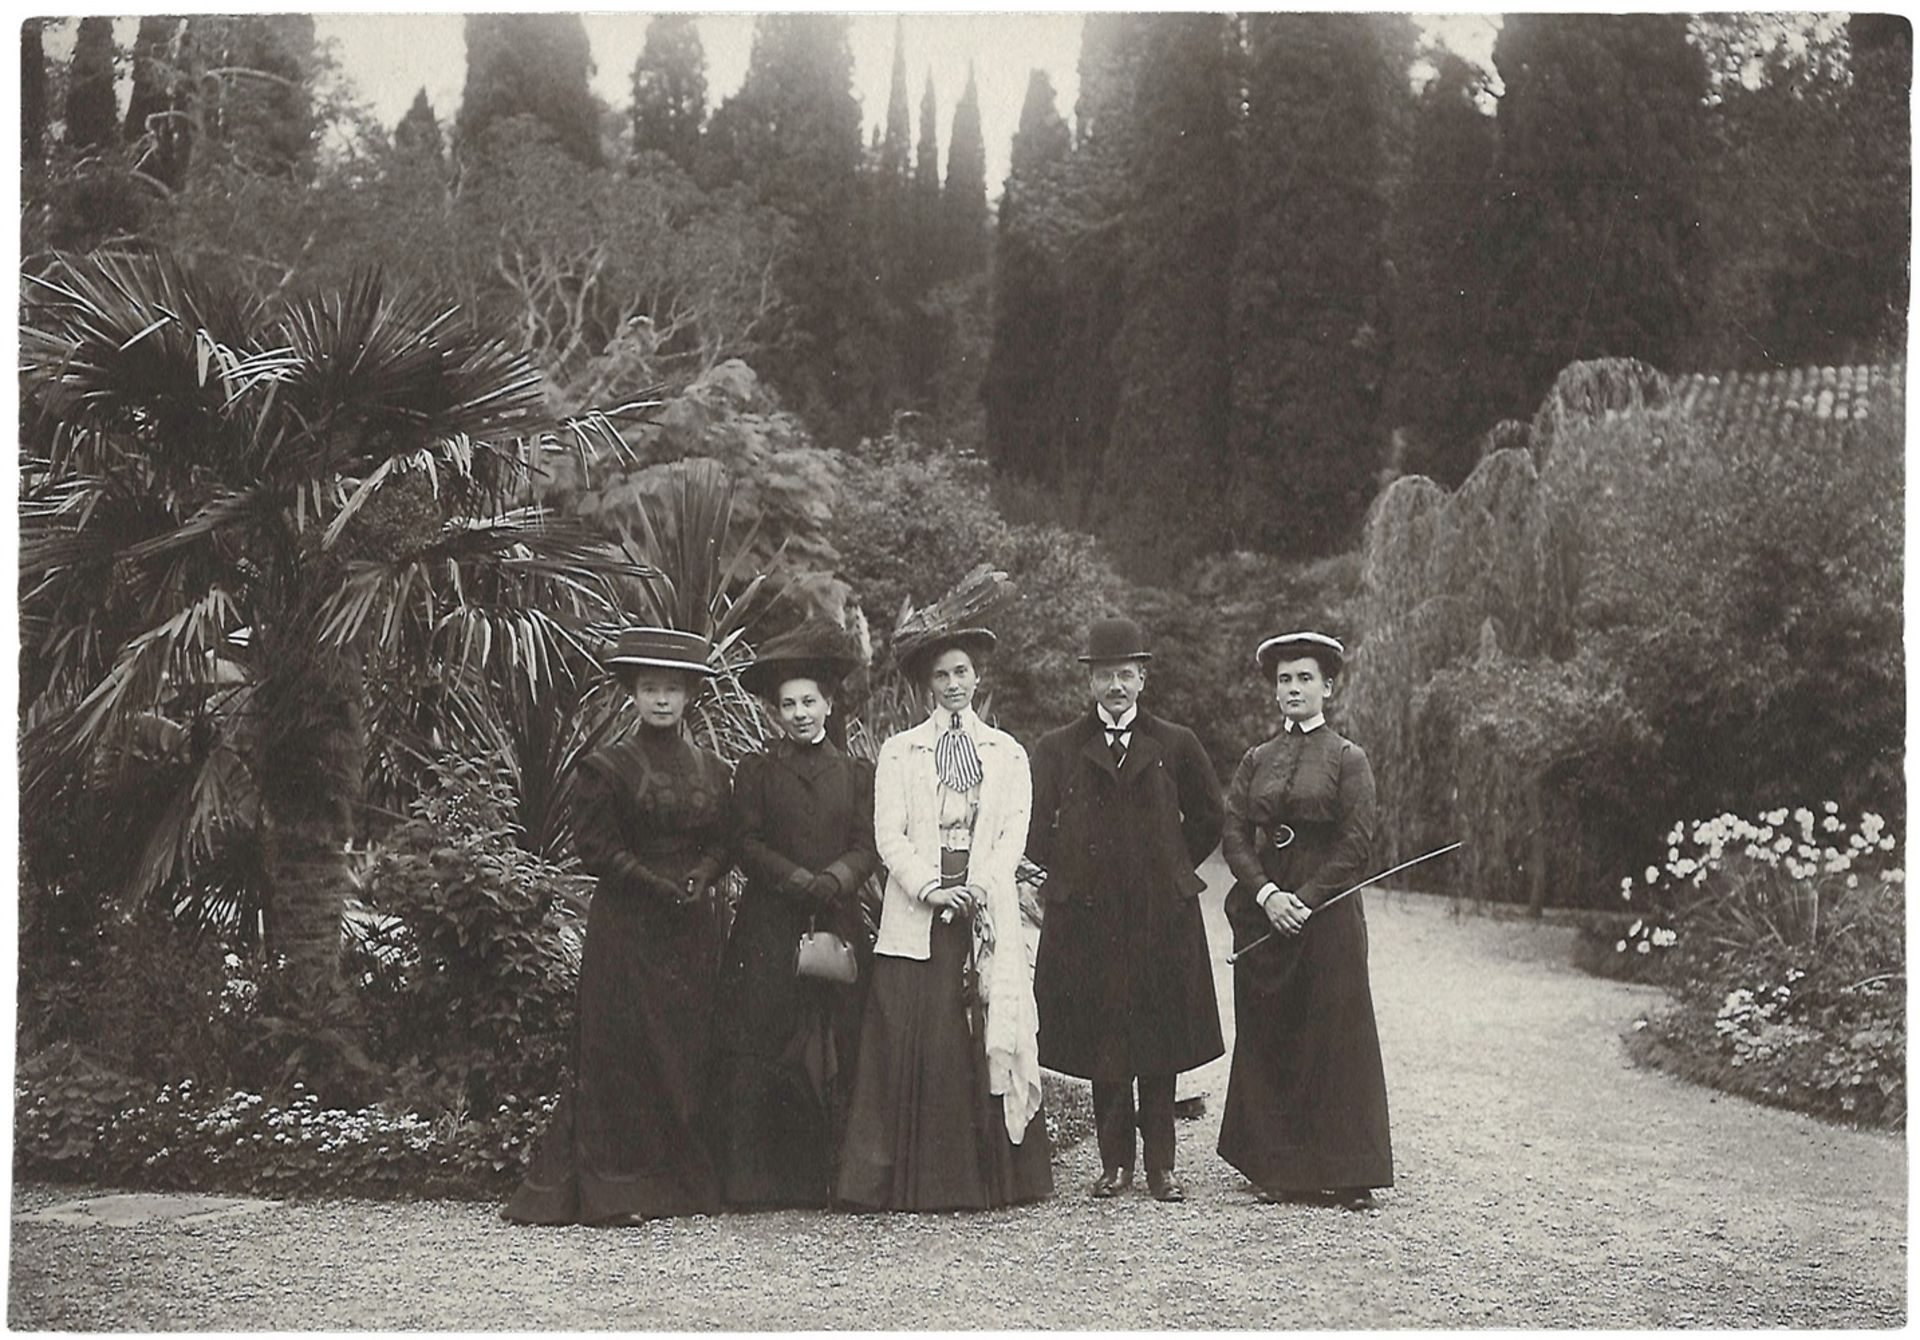 [Russian Empire]. Smirnov, I. Group portrait. Photograph. Author's print. Yalta, [late 19th century]